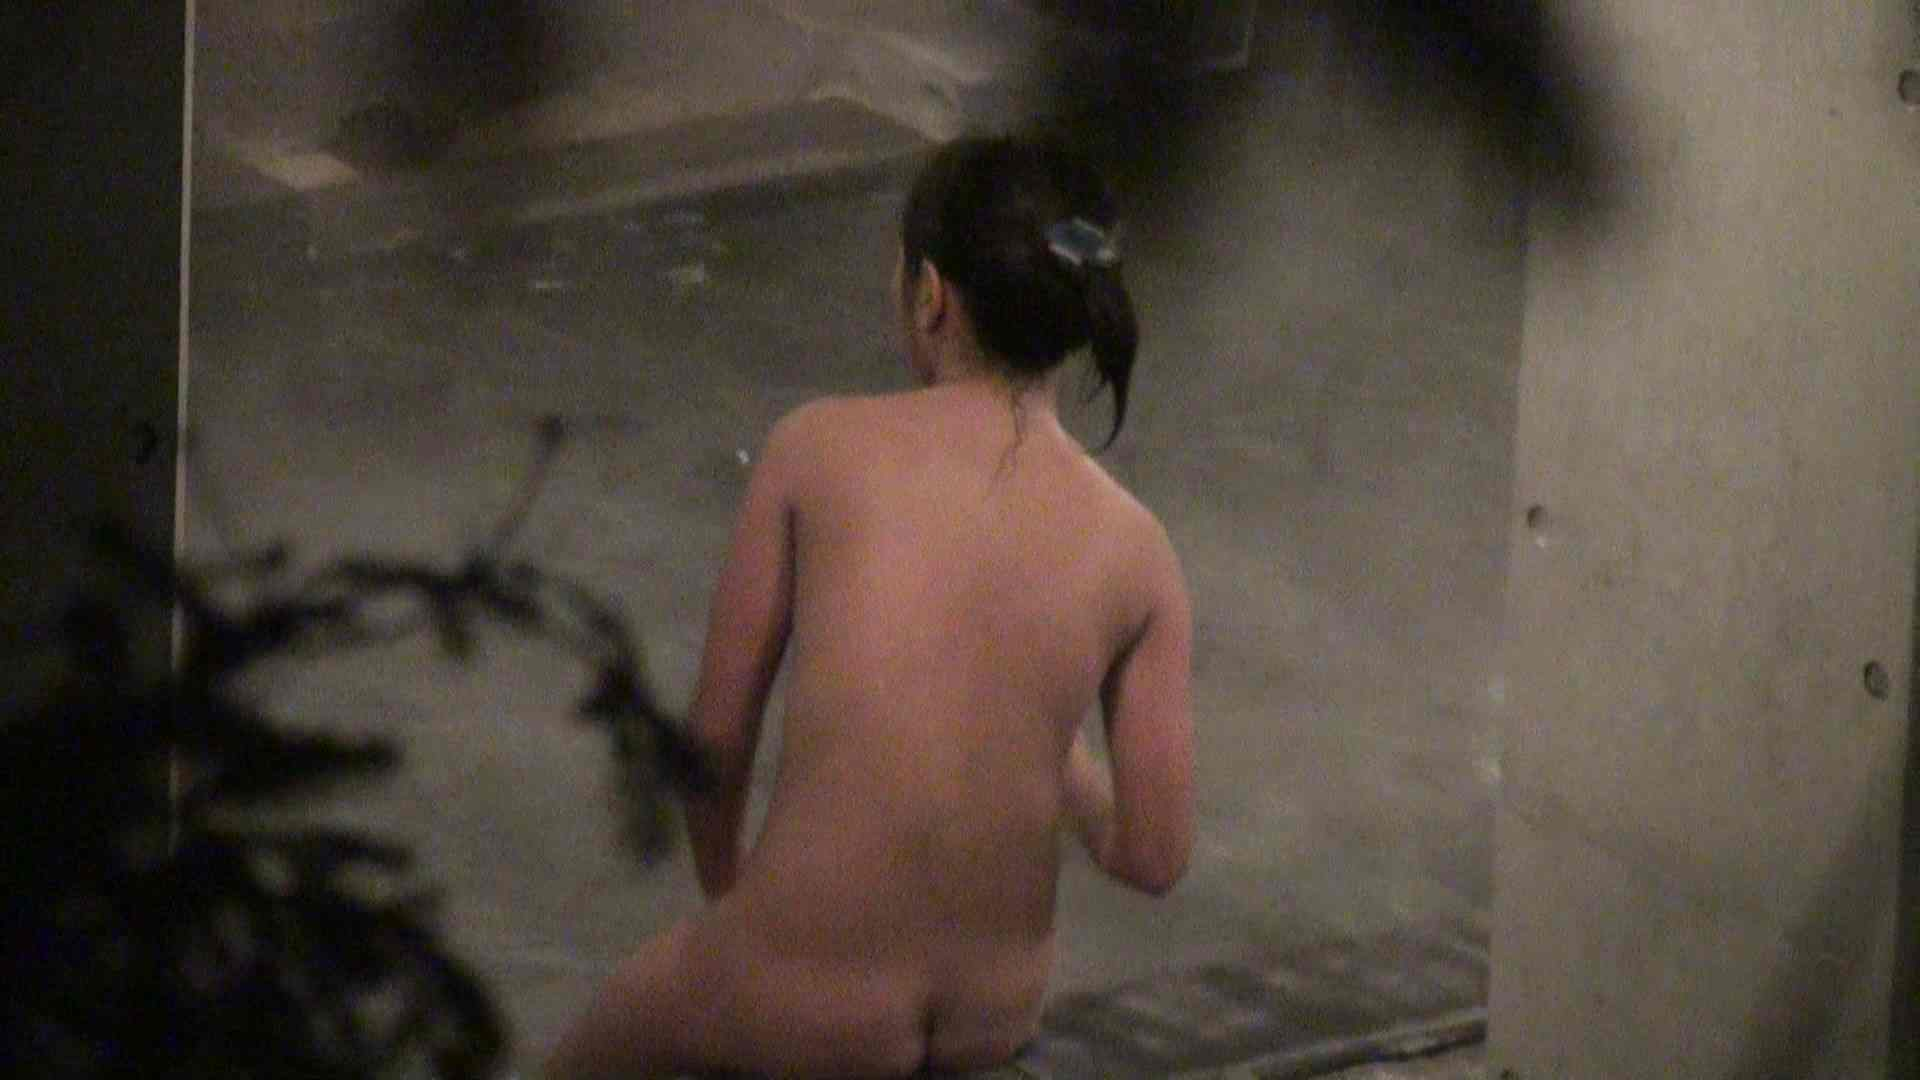 Aquaな露天風呂Vol.407 盗撮 ぱこり動画紹介 107画像 68